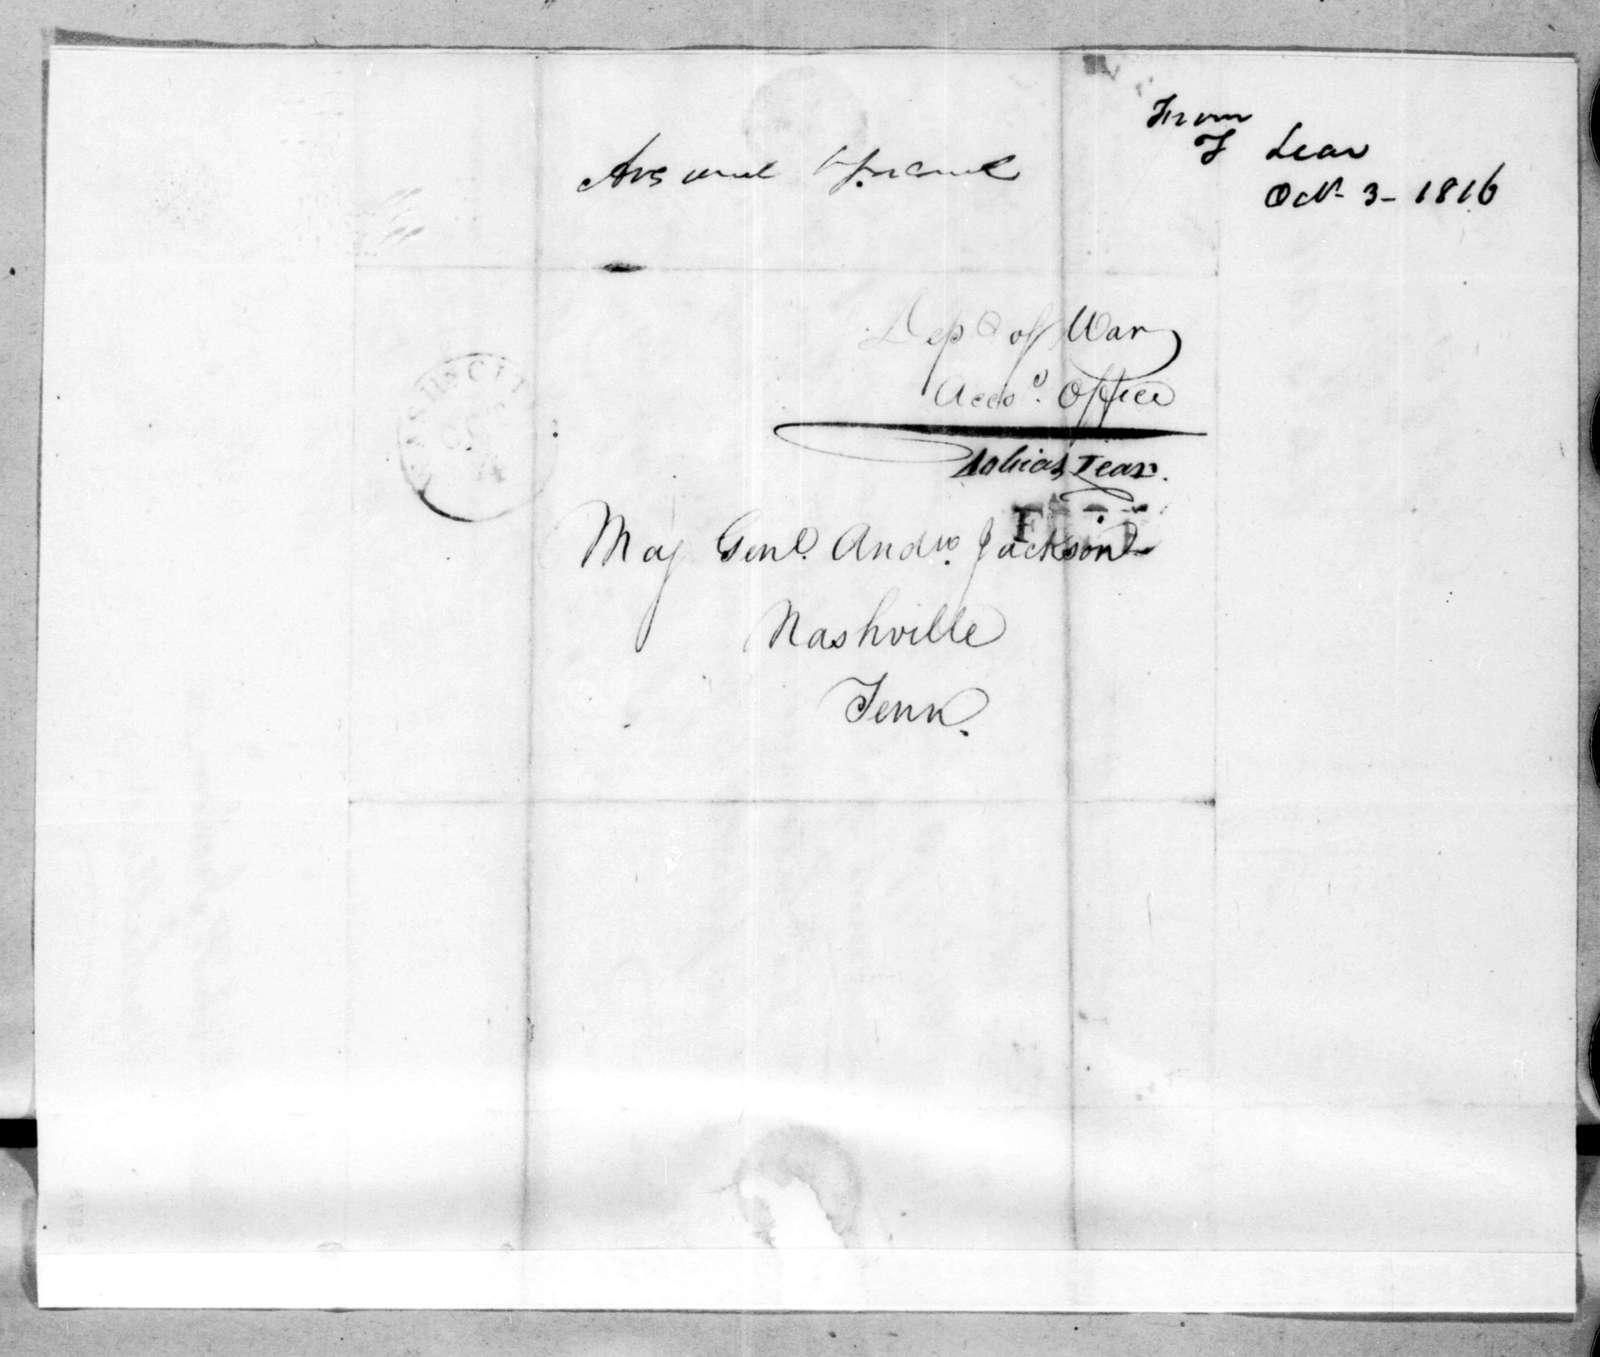 Tobias Lear to Andrew Jackson, October 3, 1816